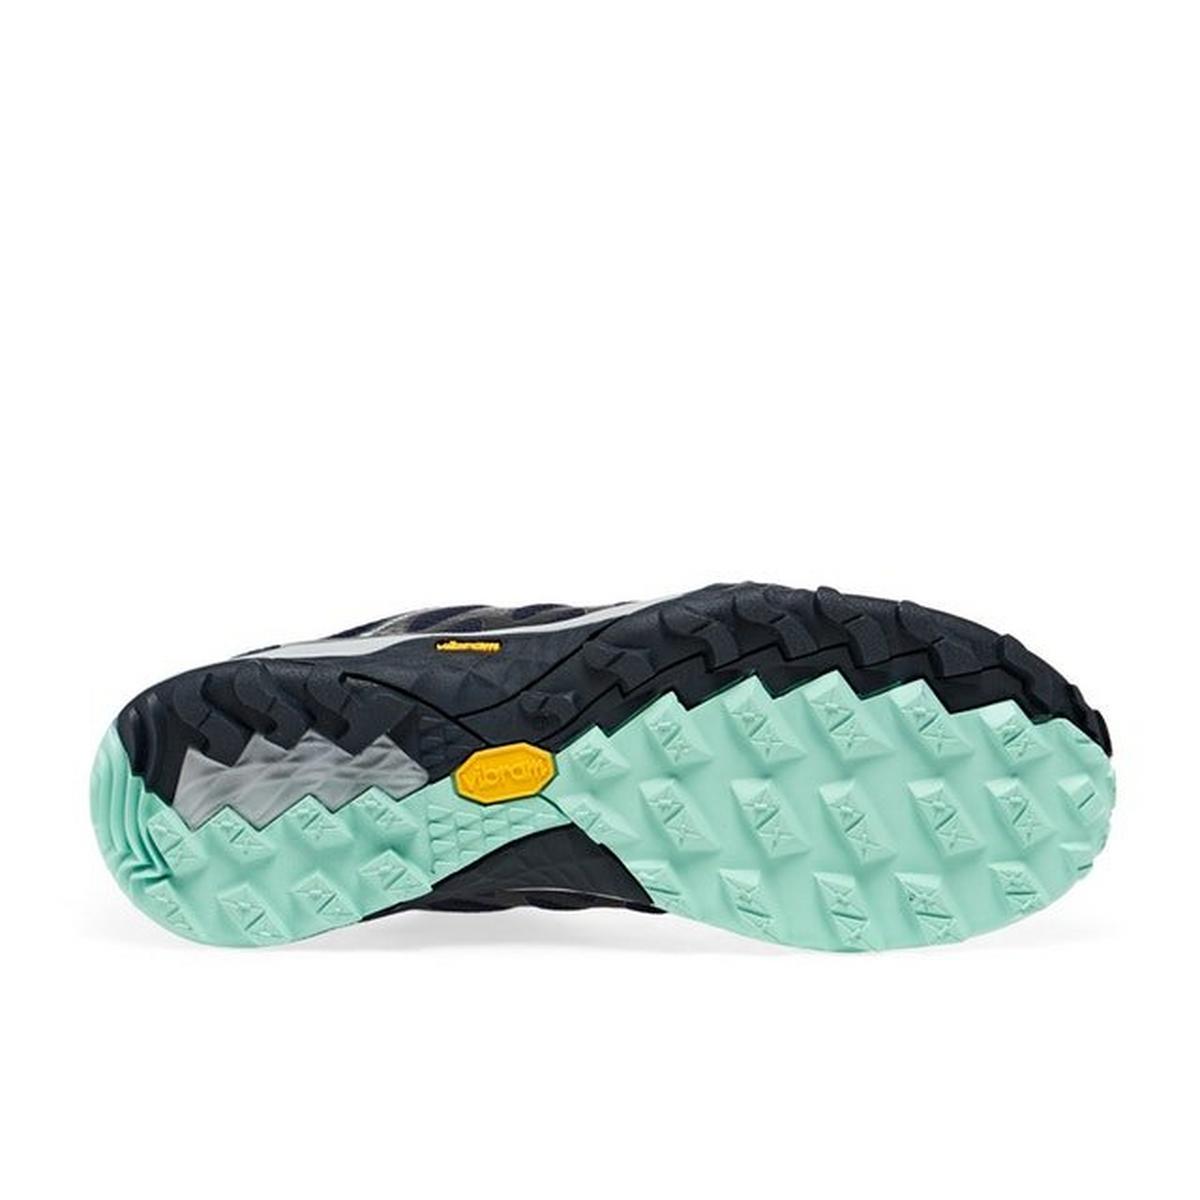 Merrell Women's Siren 3 GTX Walking Shoe